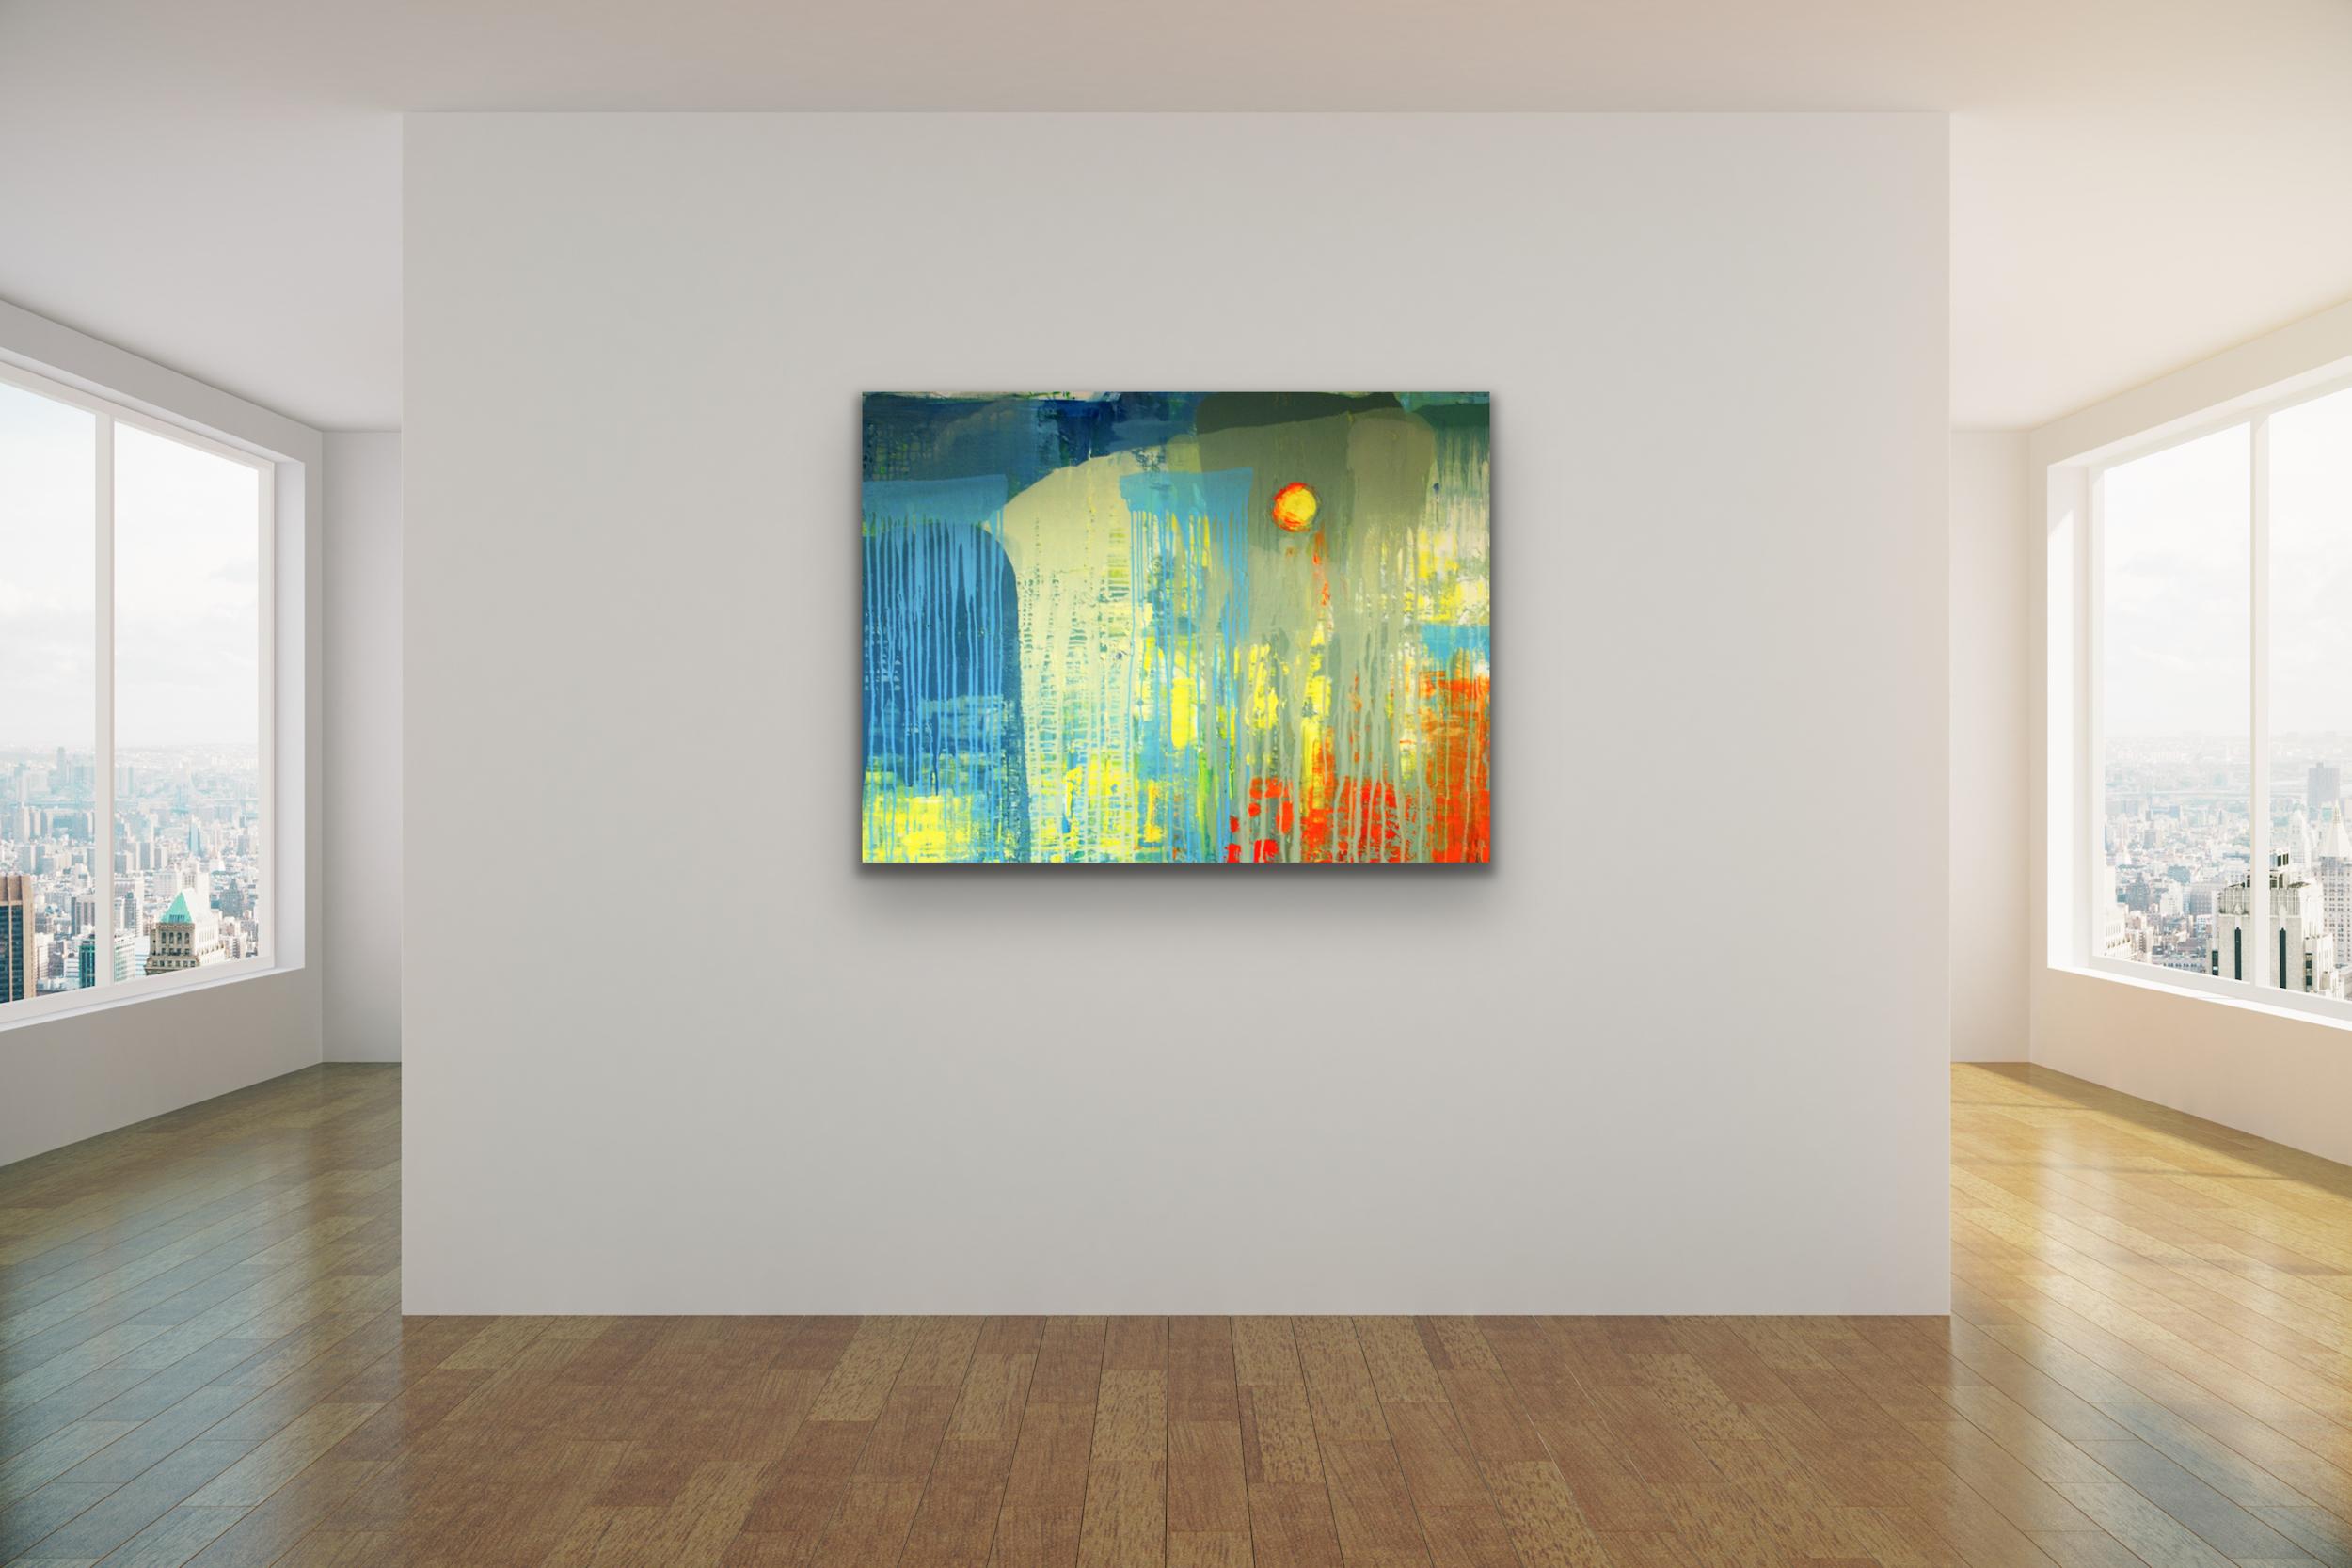 Sunrise-through-the-morning-mist-high-summer-gallery-setting-Feb-2021